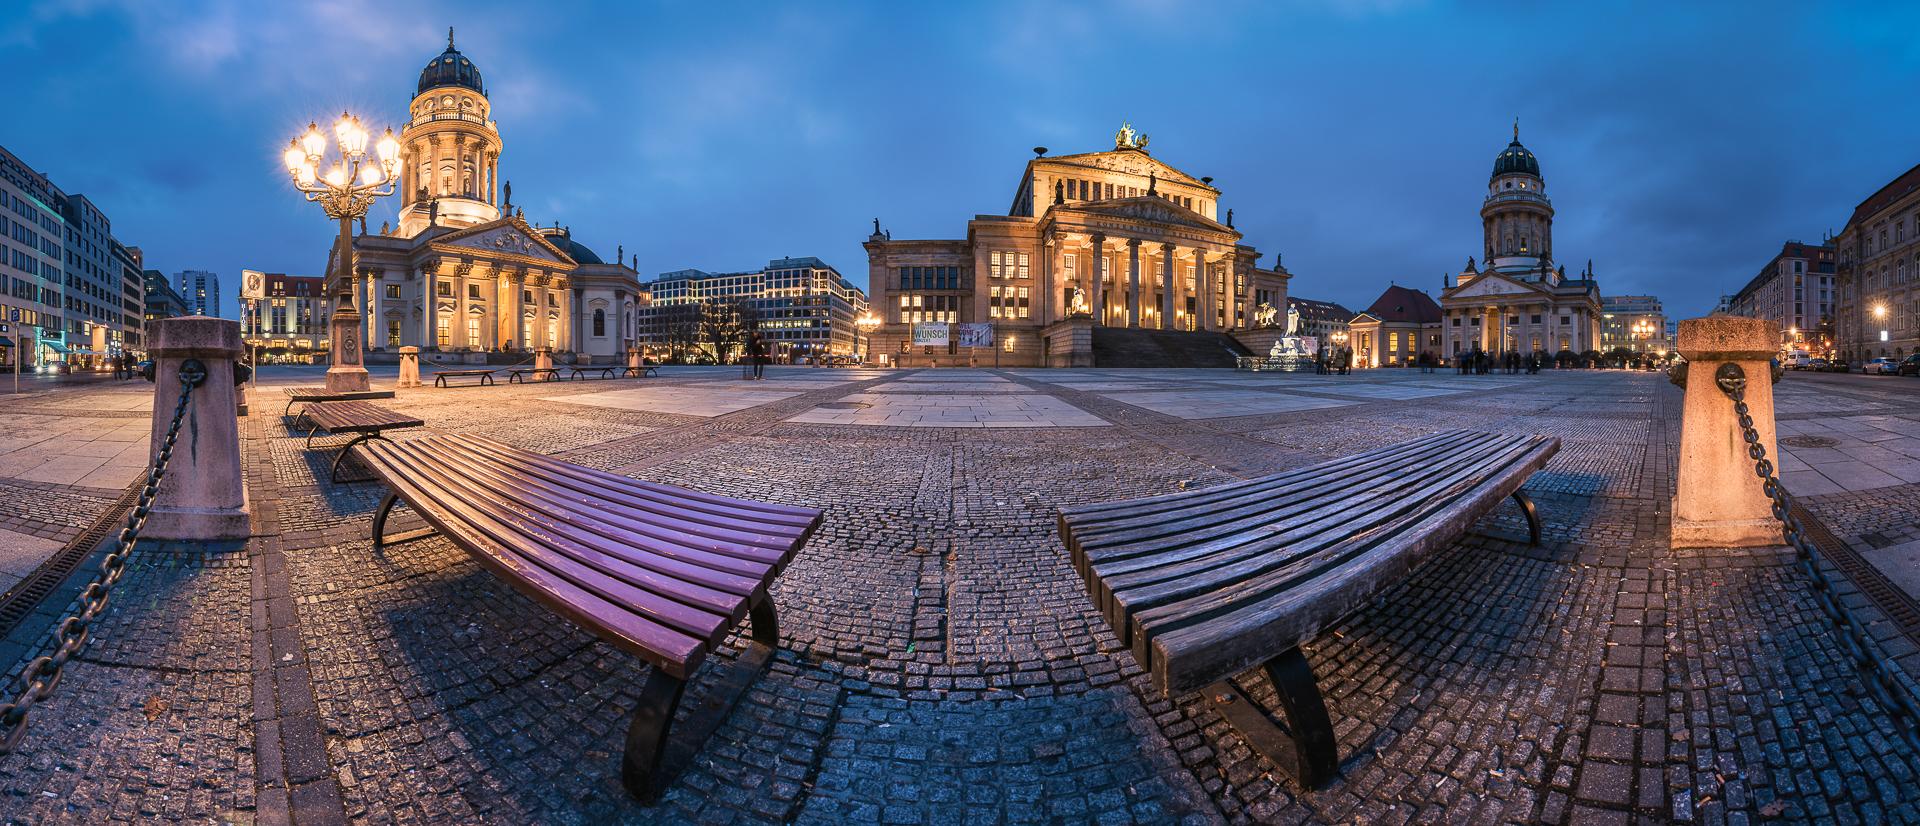 Berlin, Gendarmenmarkt, Panorama, Blue Hour, 2016